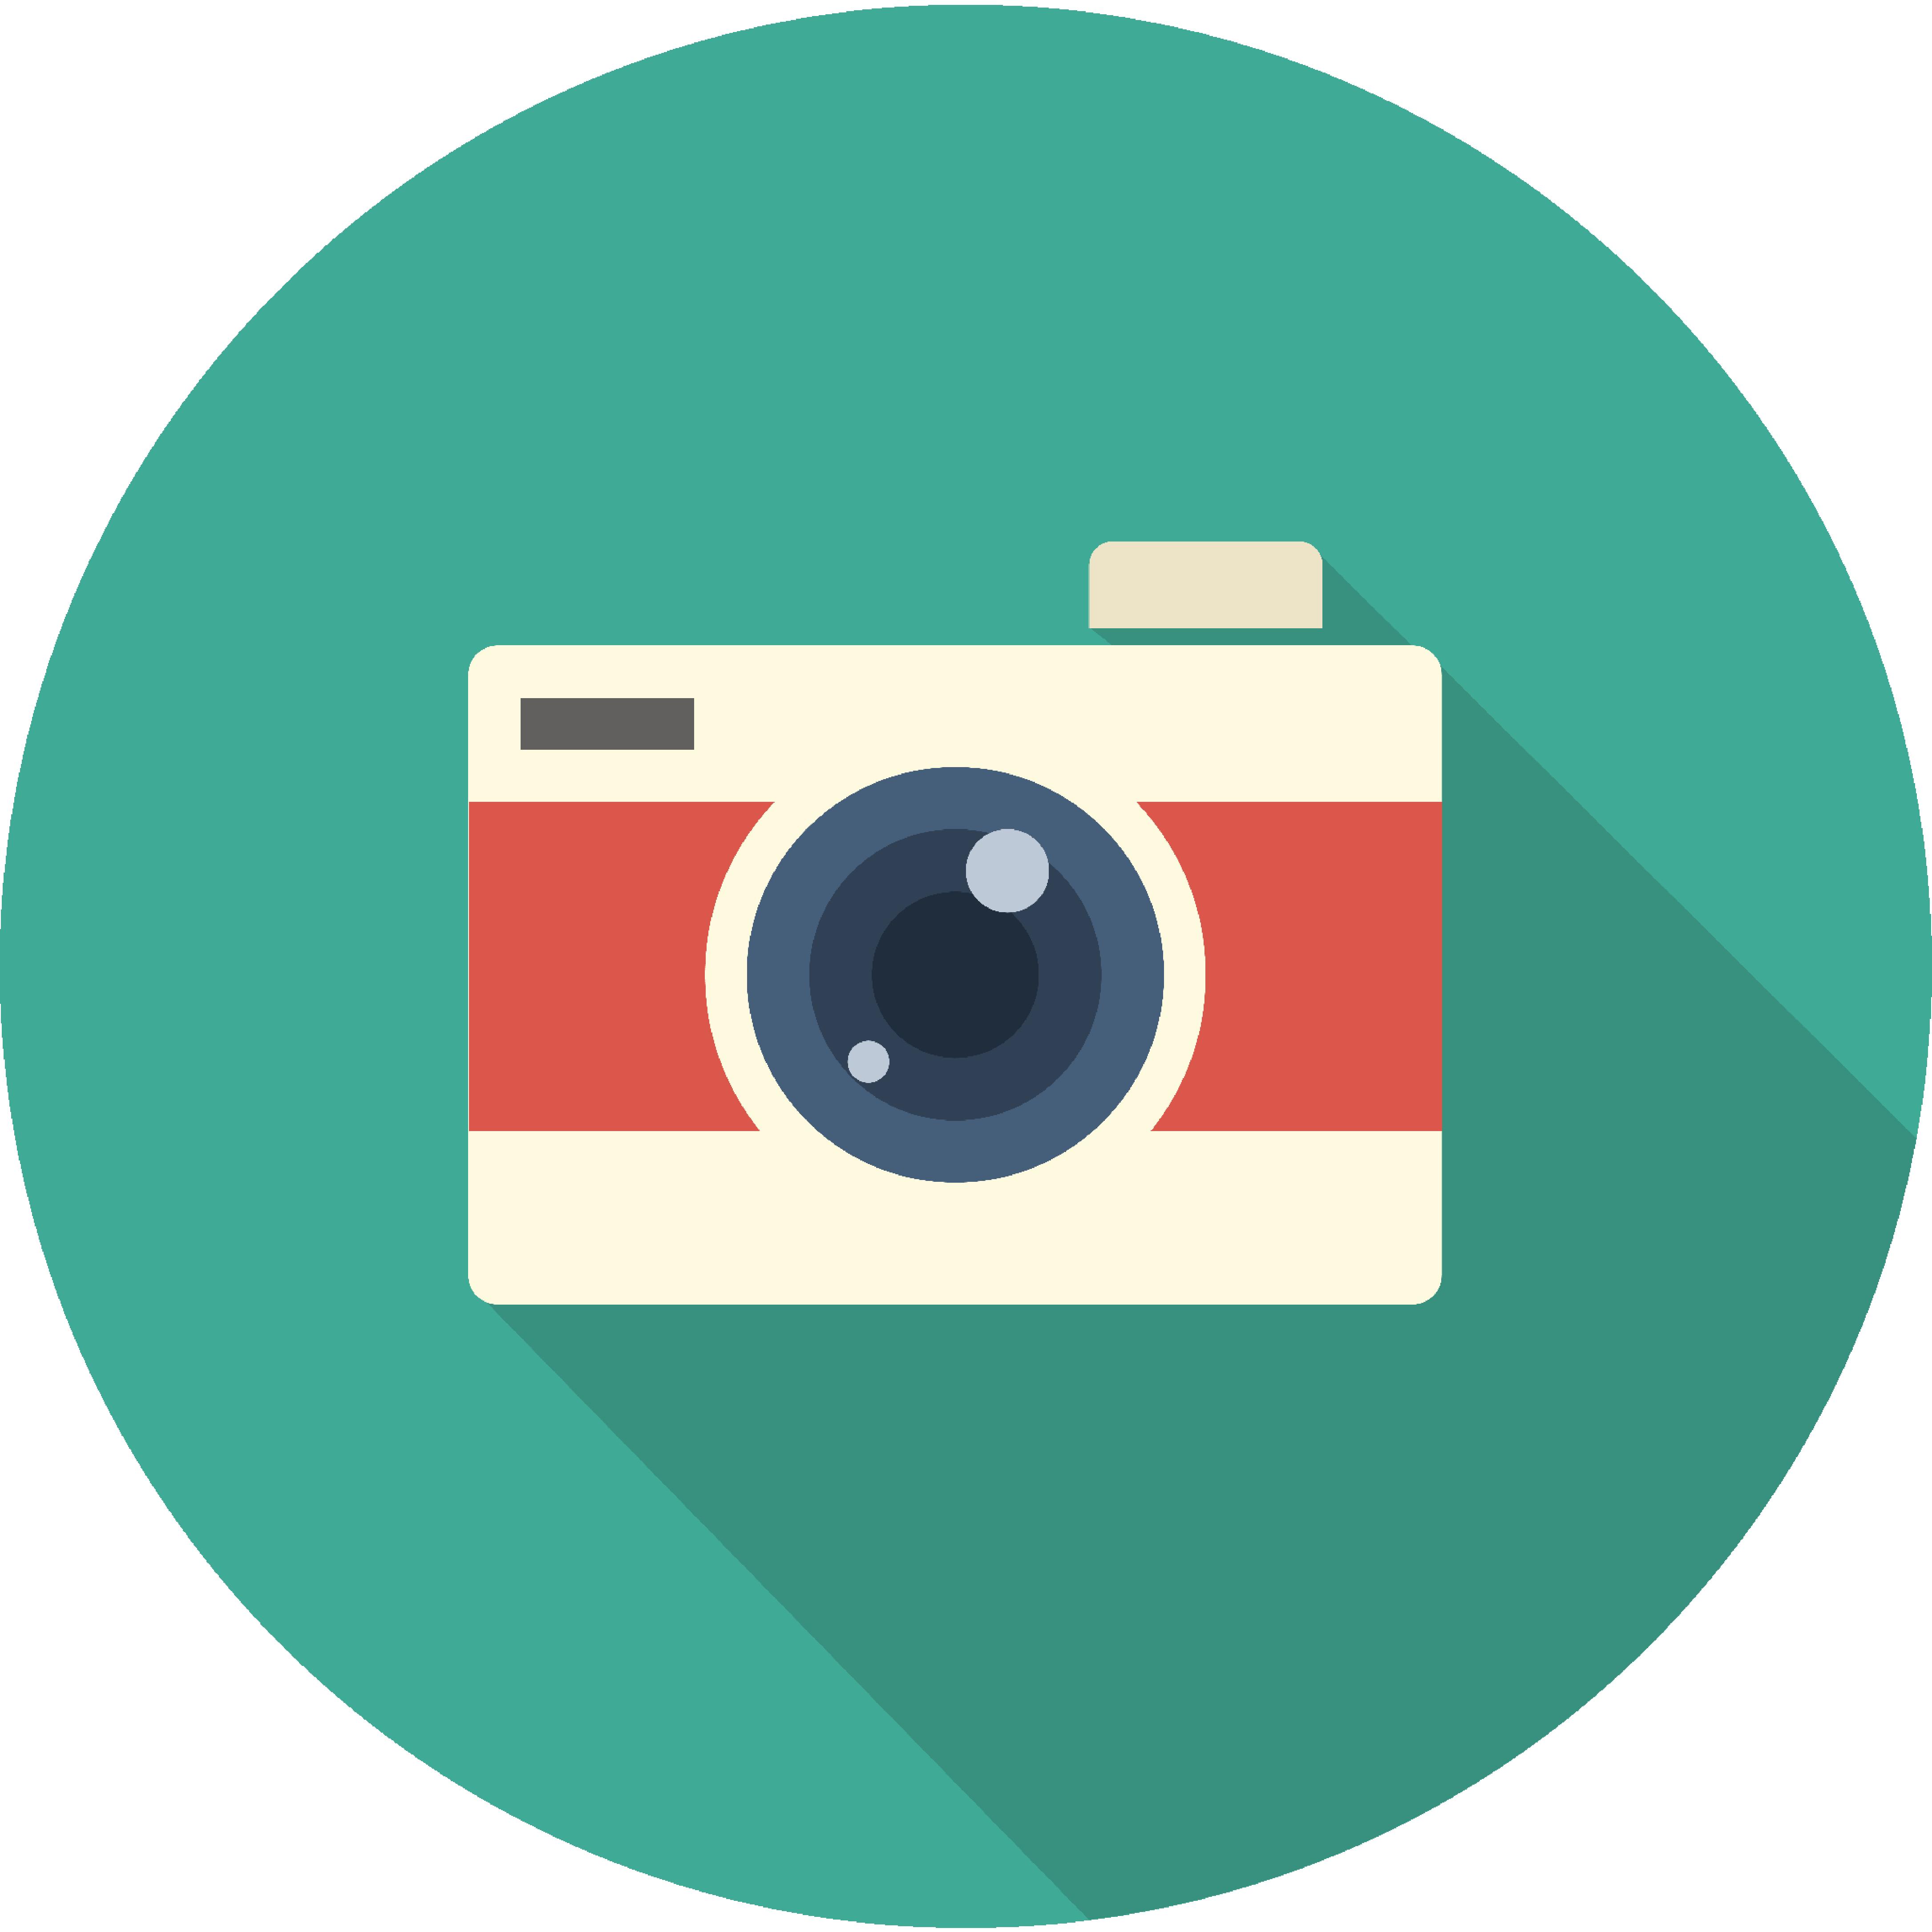 How to change the gallery icon to camera on kik - Korean